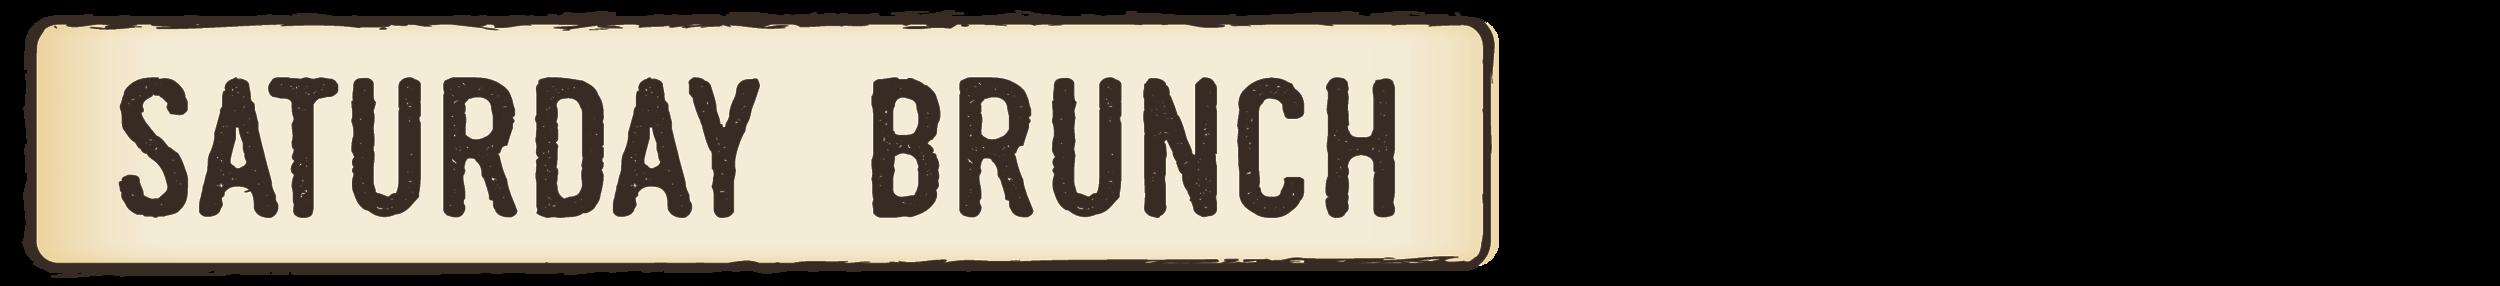 MobileBrunch-47.png